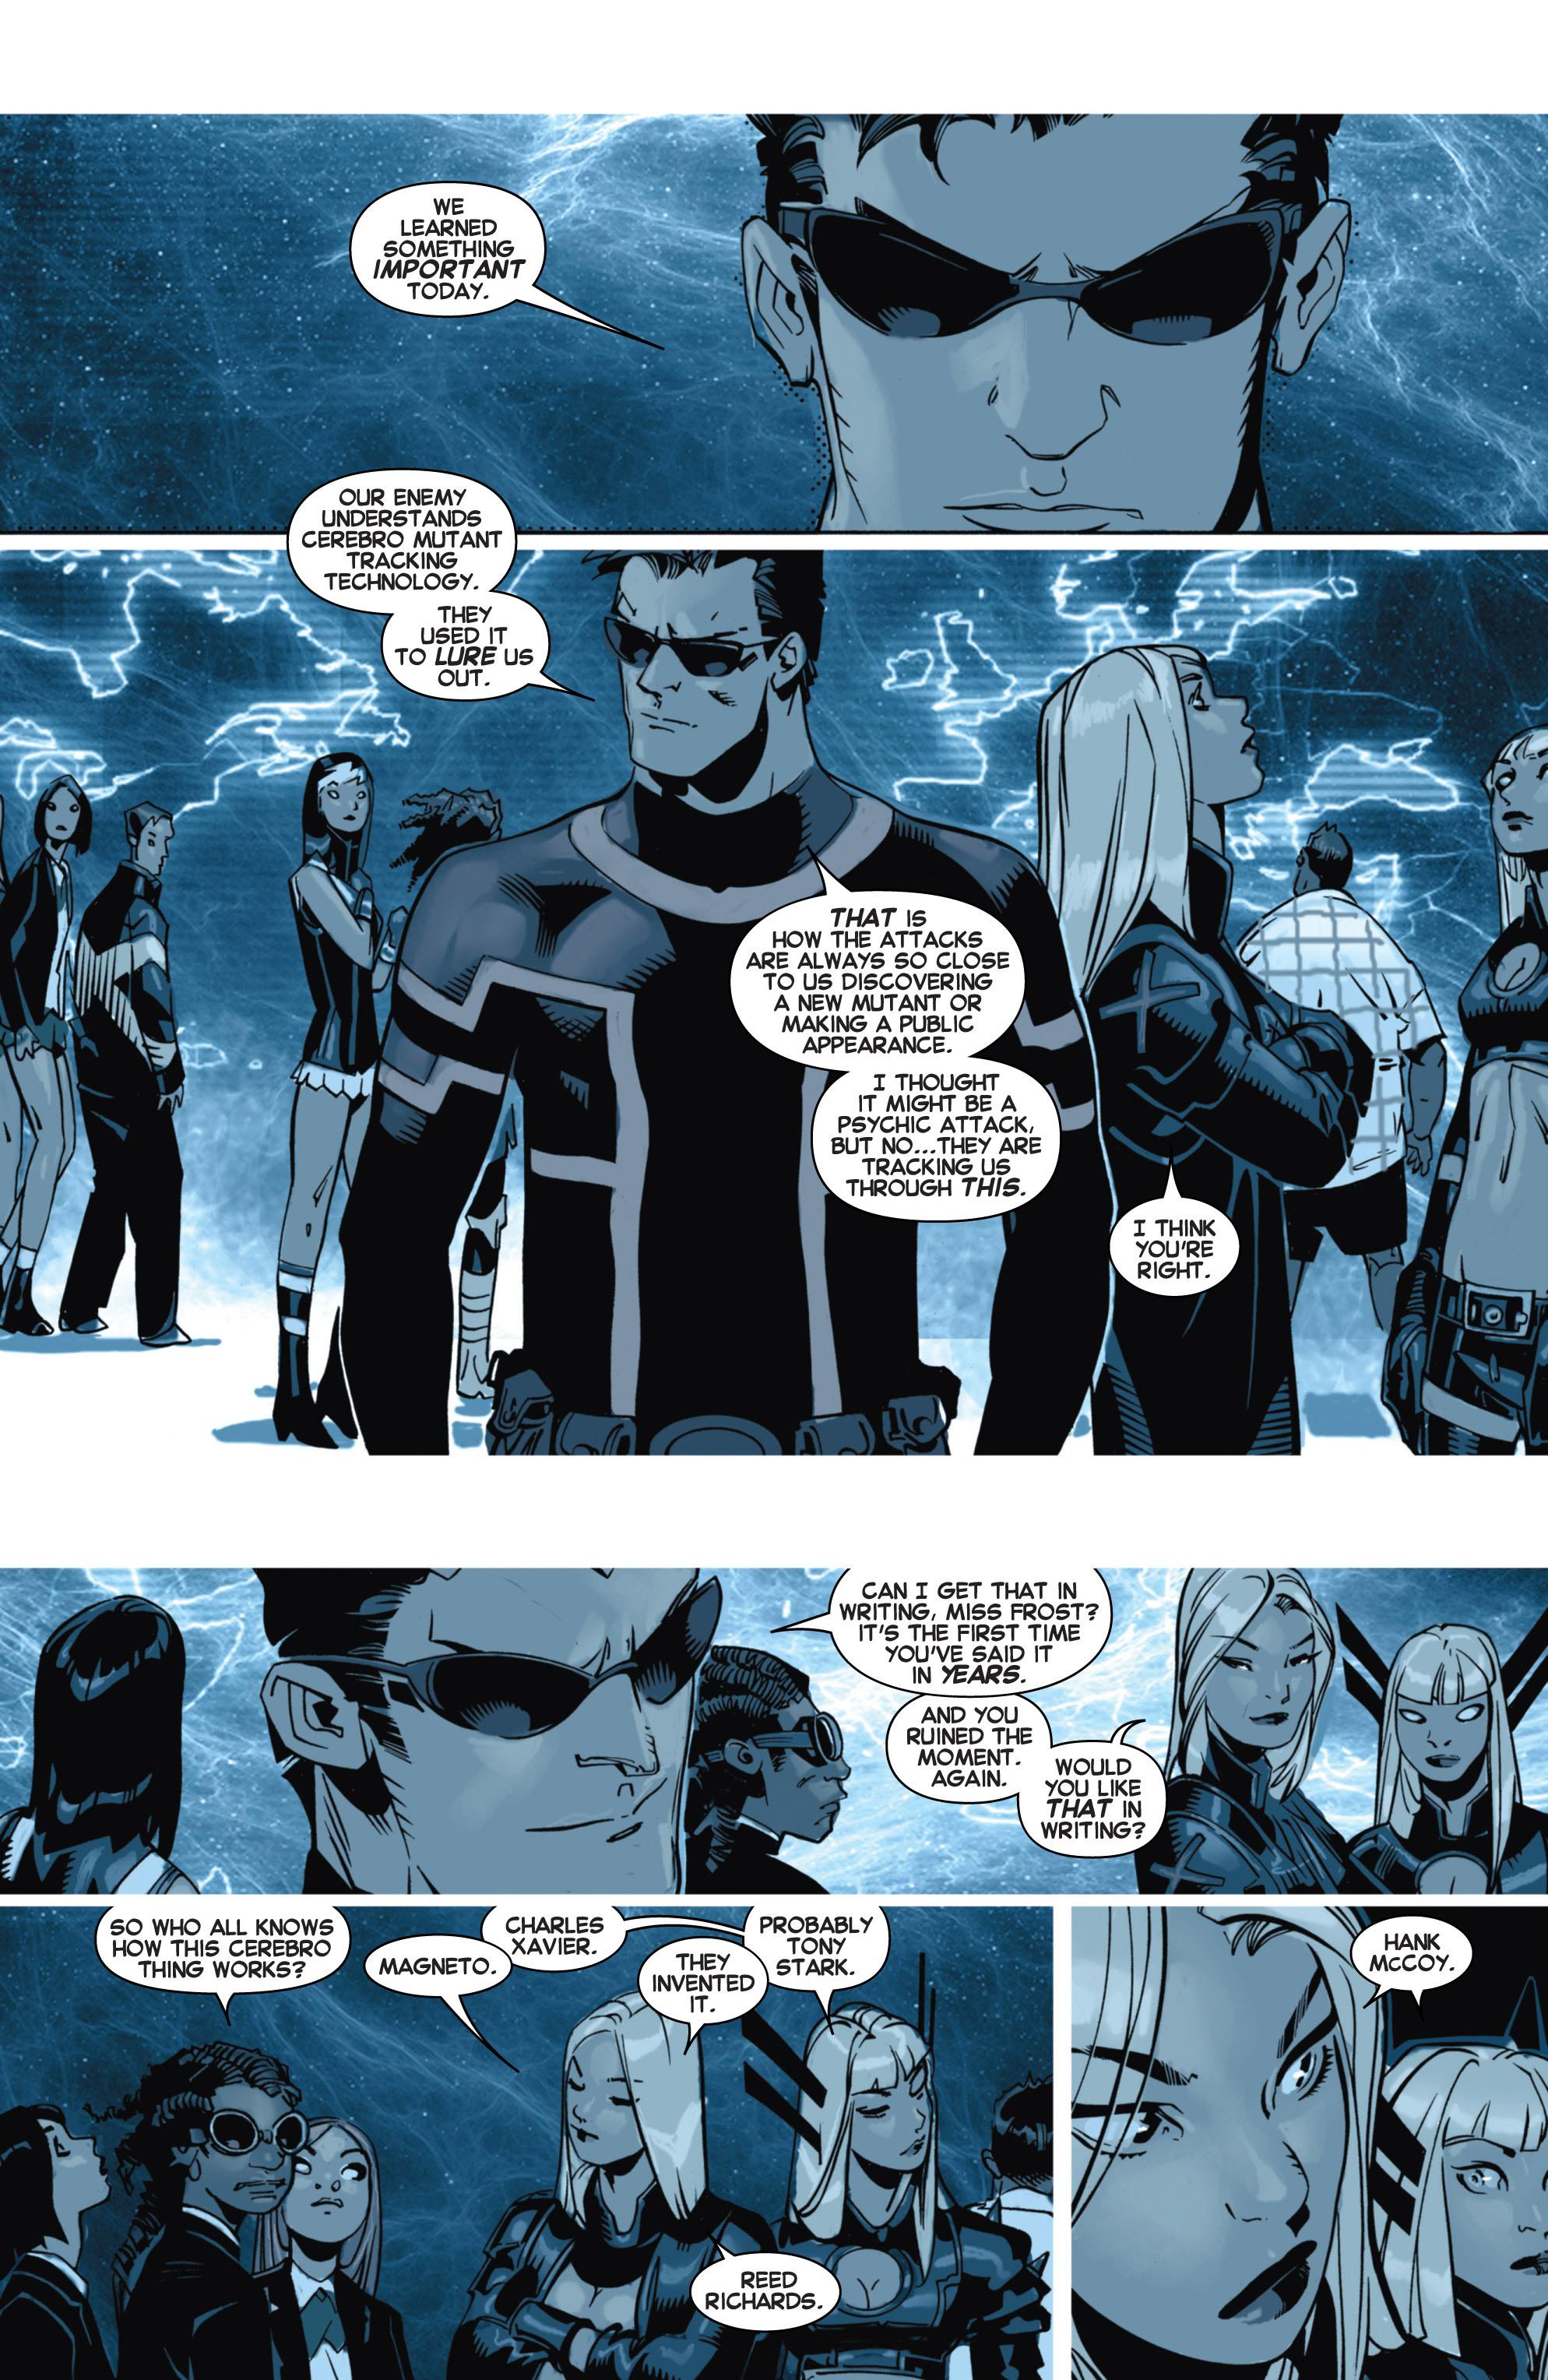 Read online Uncanny X-Men (2013) comic -  Issue # _TPB 4 - vs. S.H.I.E.L.D - 36